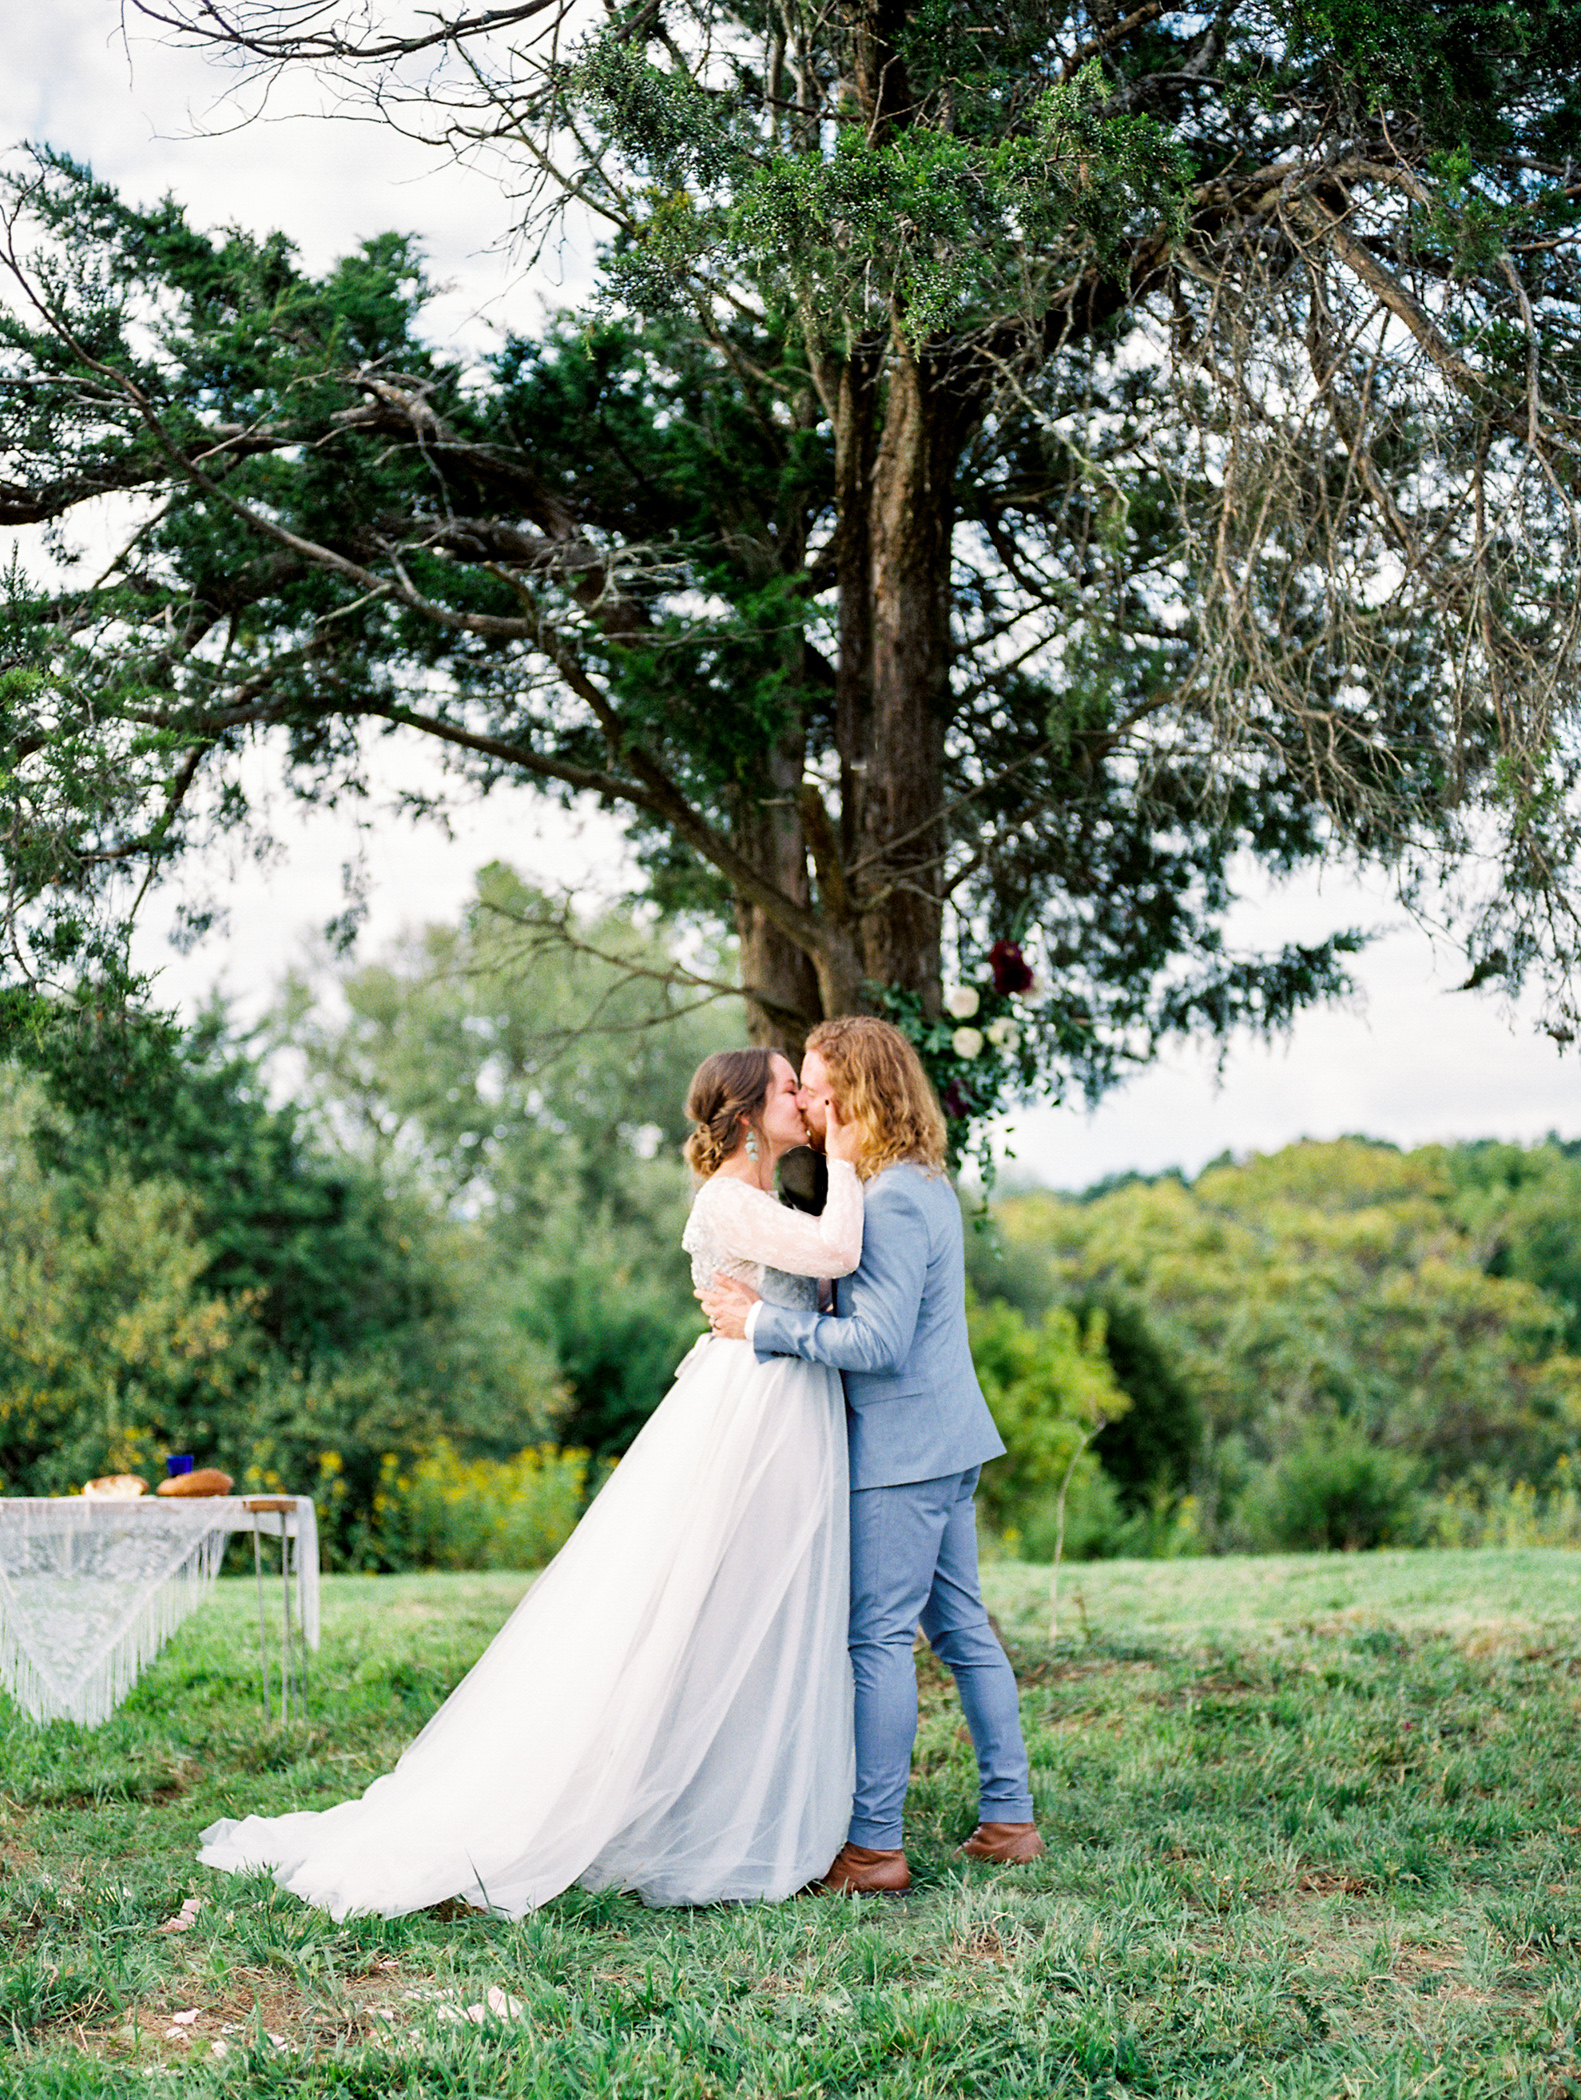 Charlotte-Film-Wedding_Photographer-heartstone-lodge-virginia-24.jpg